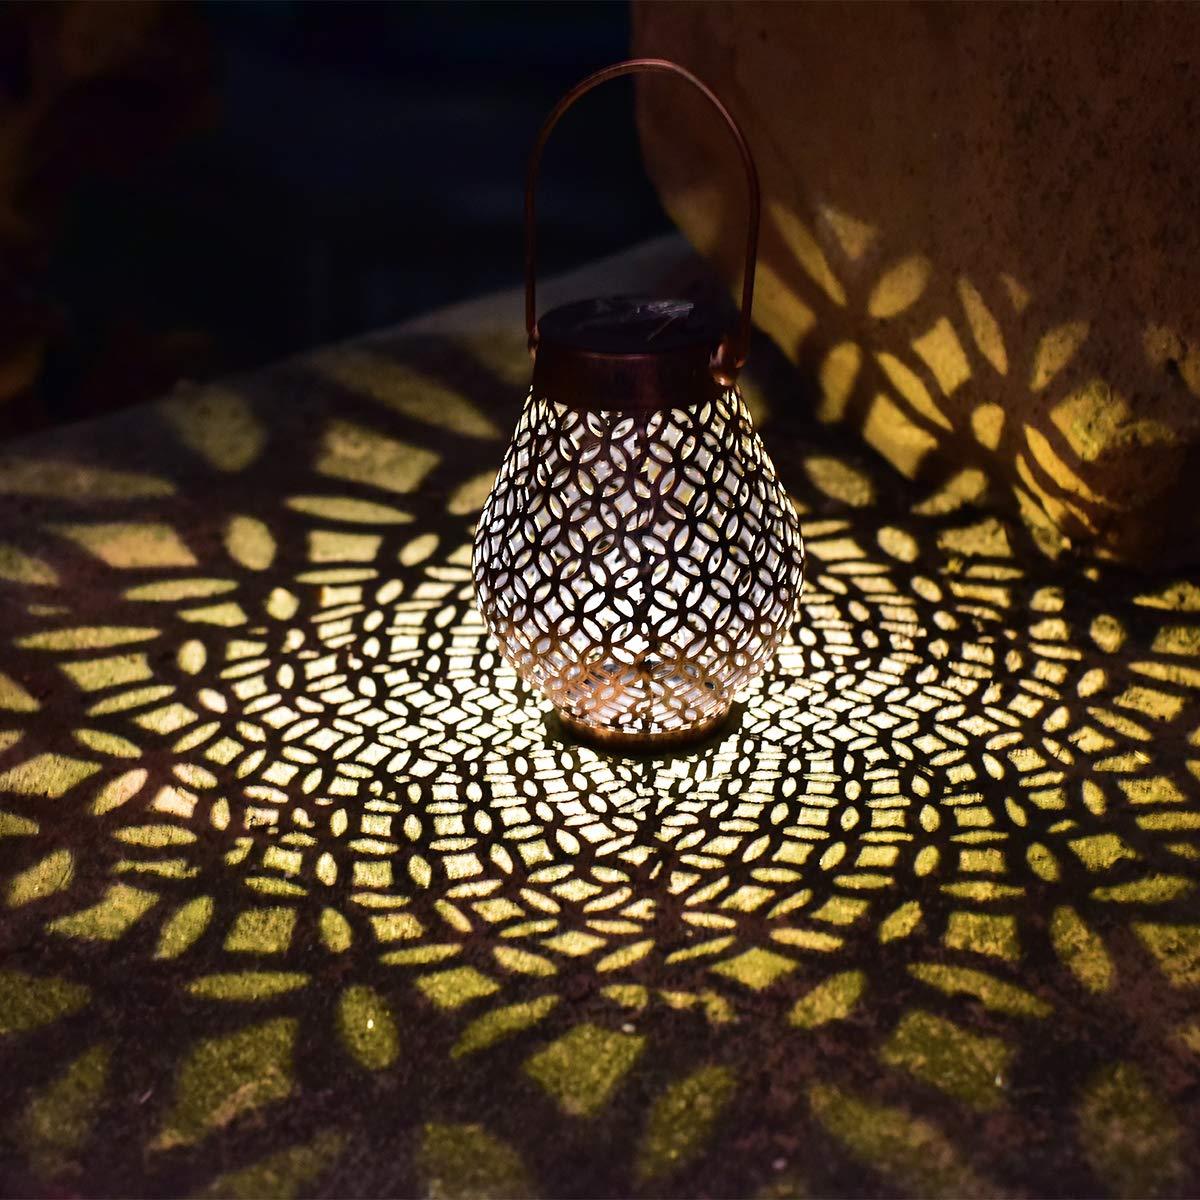 6.9 inch Dia Matt White 2 Pack Solar Lanterns Outdoor Decorative Hanging Solar Lights,Metal Waterproof Table Lamp for Garden Patio Yard Decor